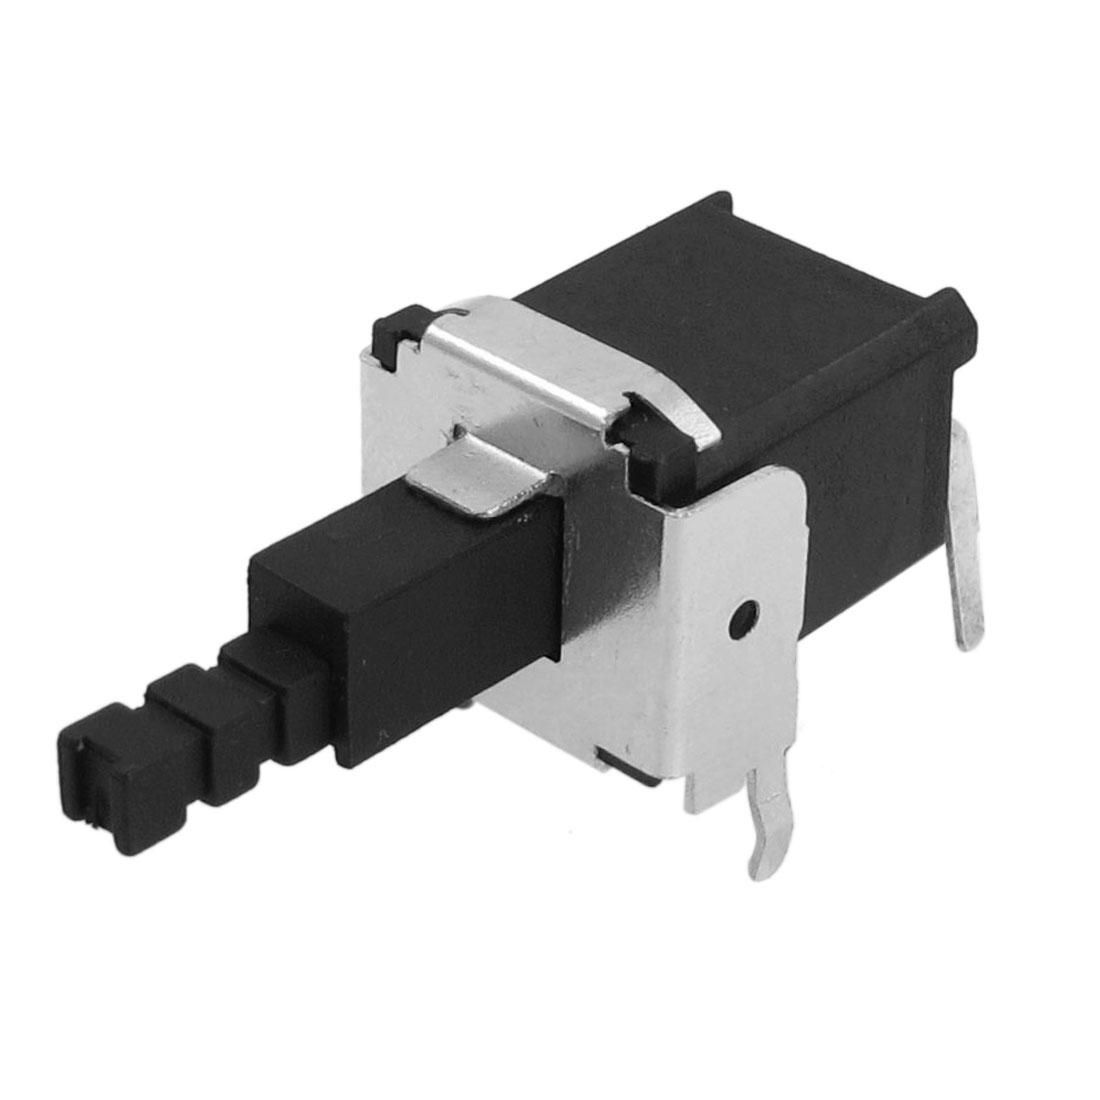 17x12x11mm 2 Terminal DIP Through Hole Self-locking Push Button Tactile Tact Switch